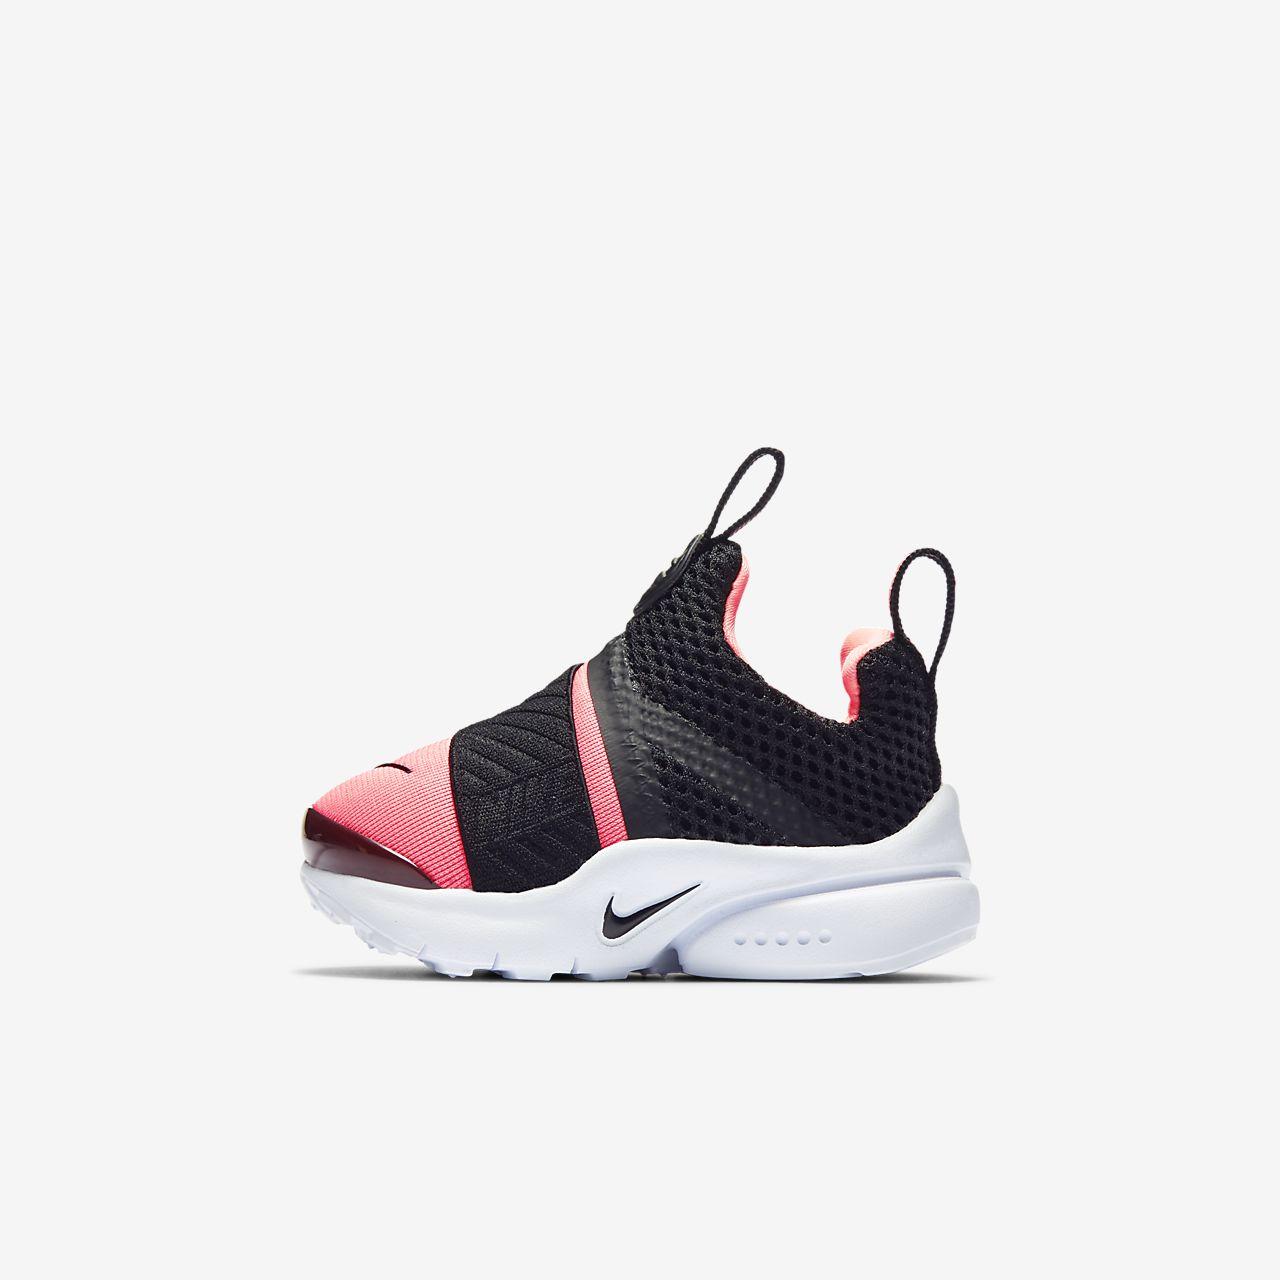 Nike Presto Extreme Baby & Toddler SE